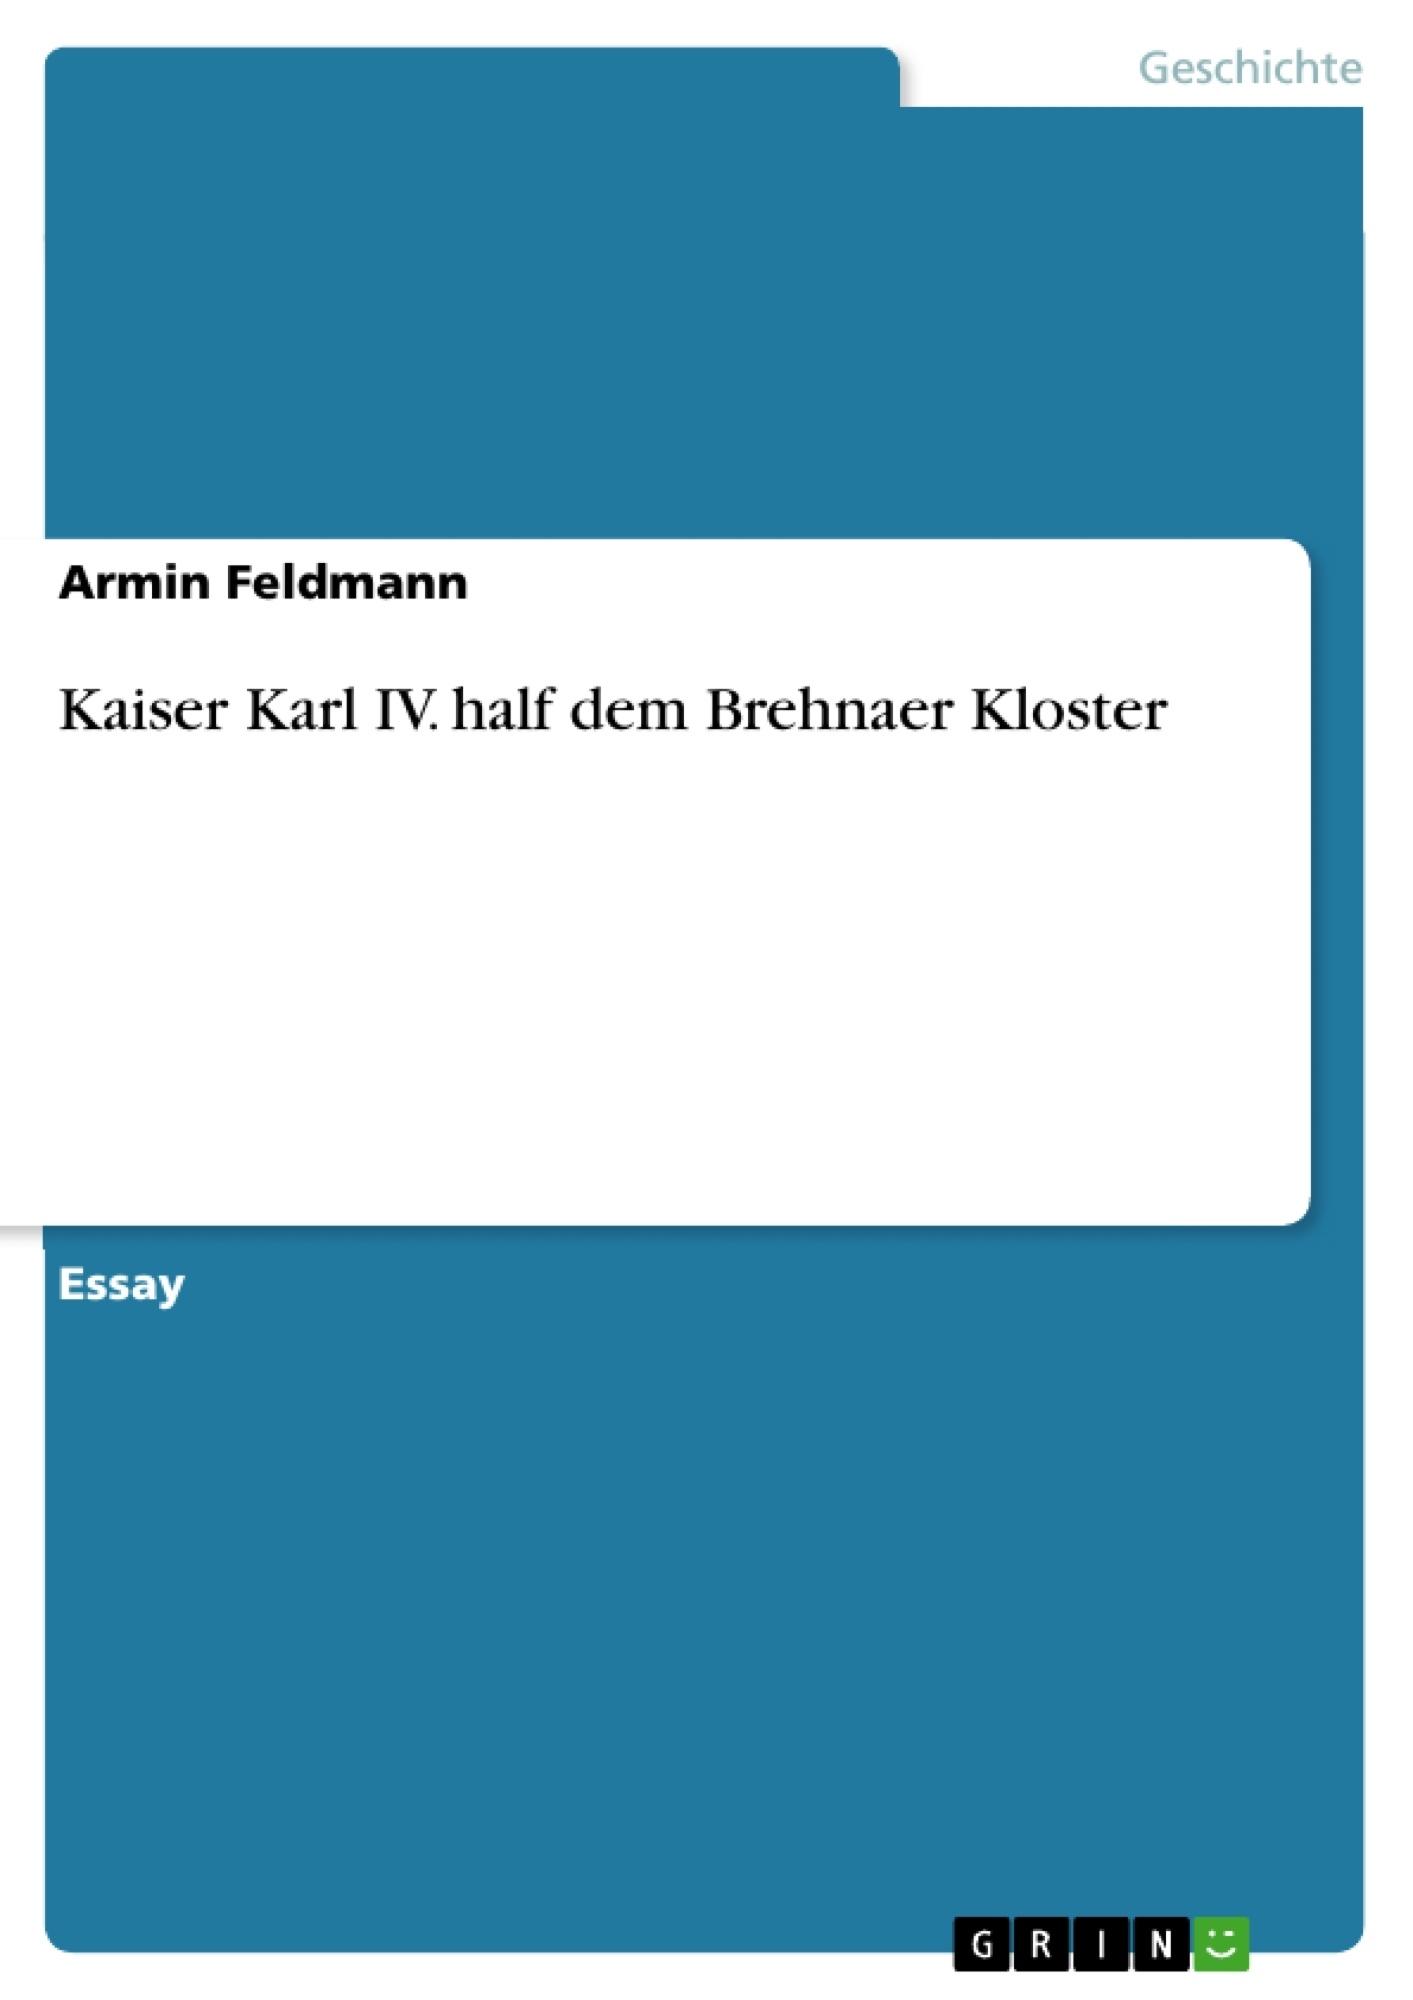 Titel: Kaiser Karl IV. half dem Brehnaer Kloster